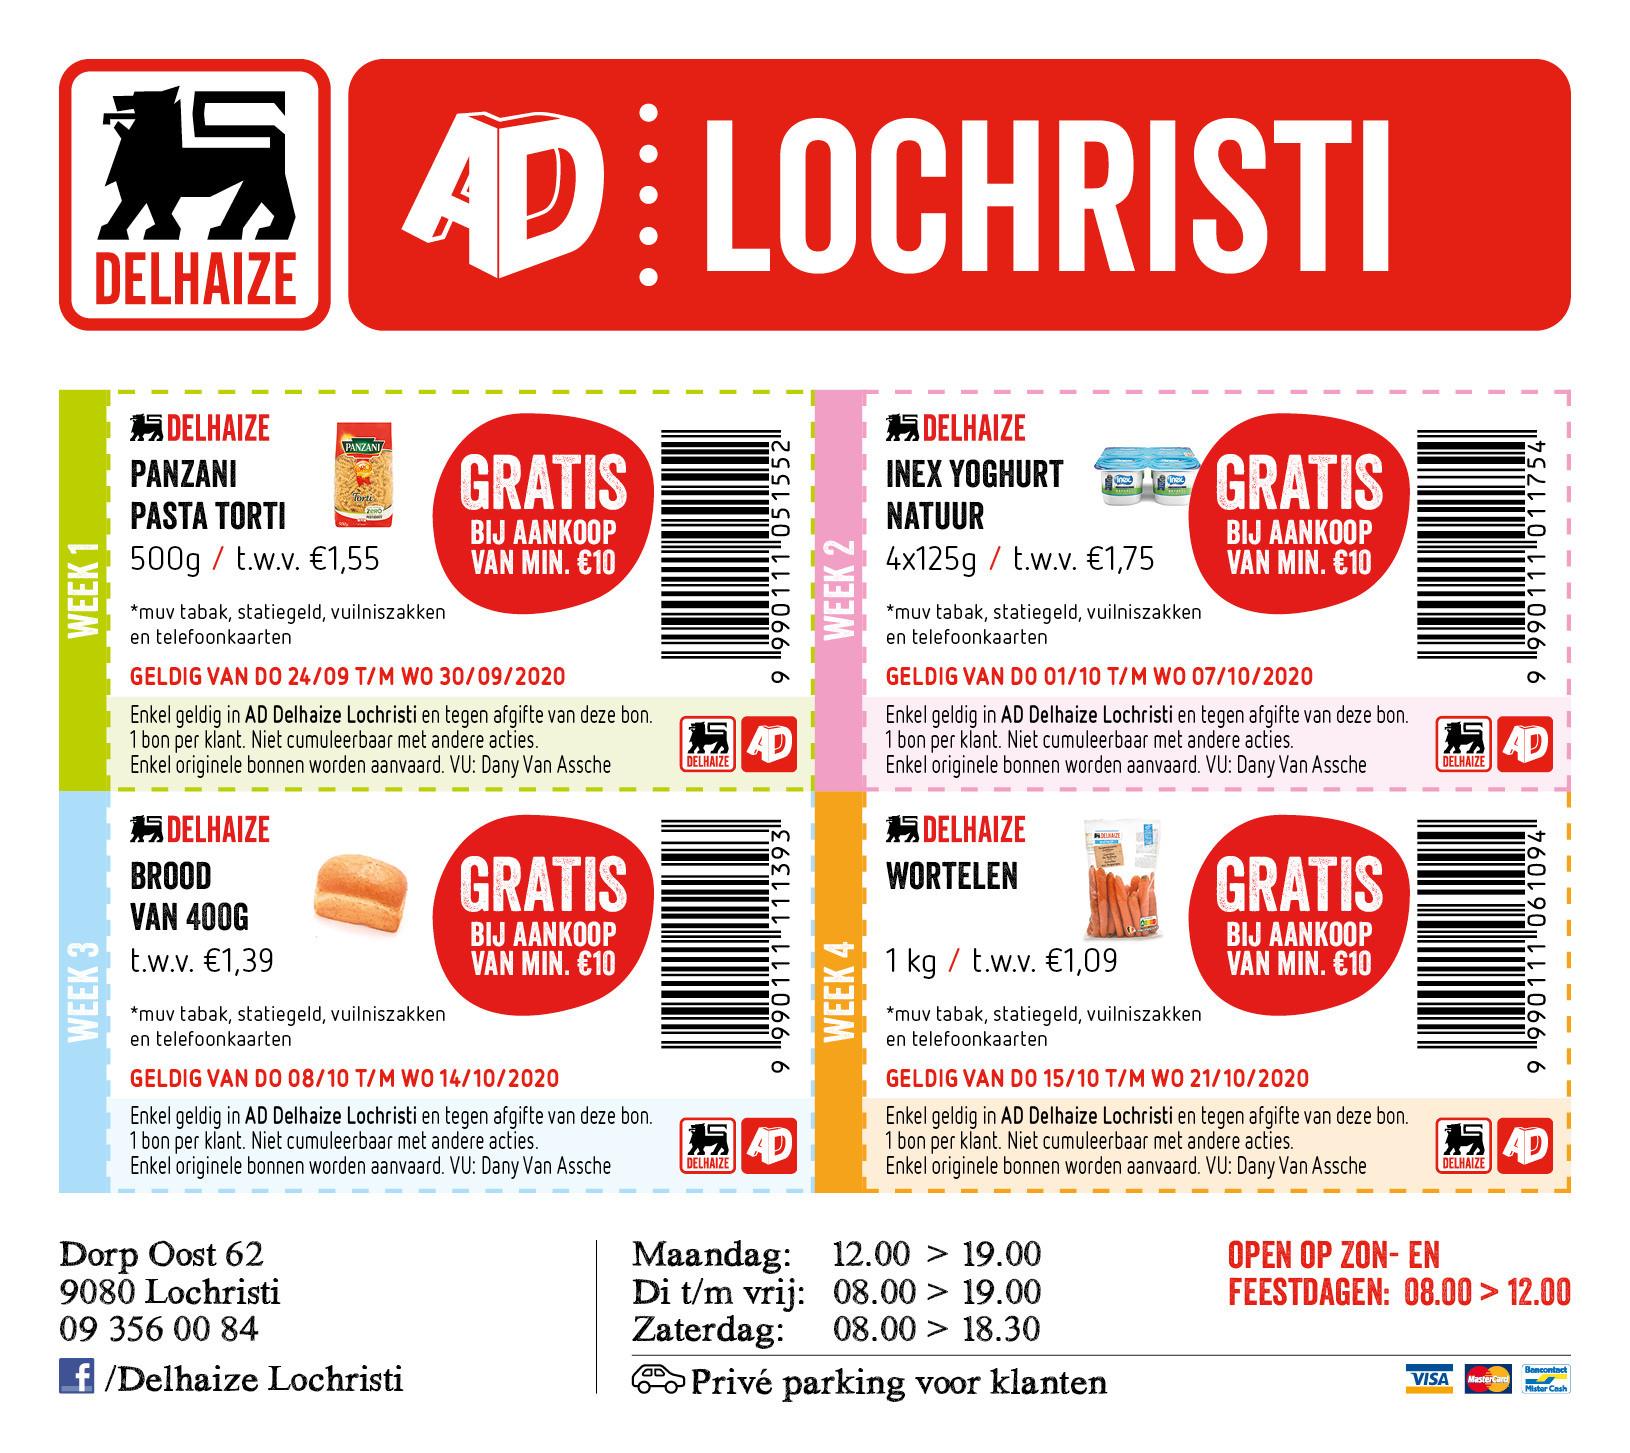 AD_Lochristi_Lochristi_NJ2020.jpg